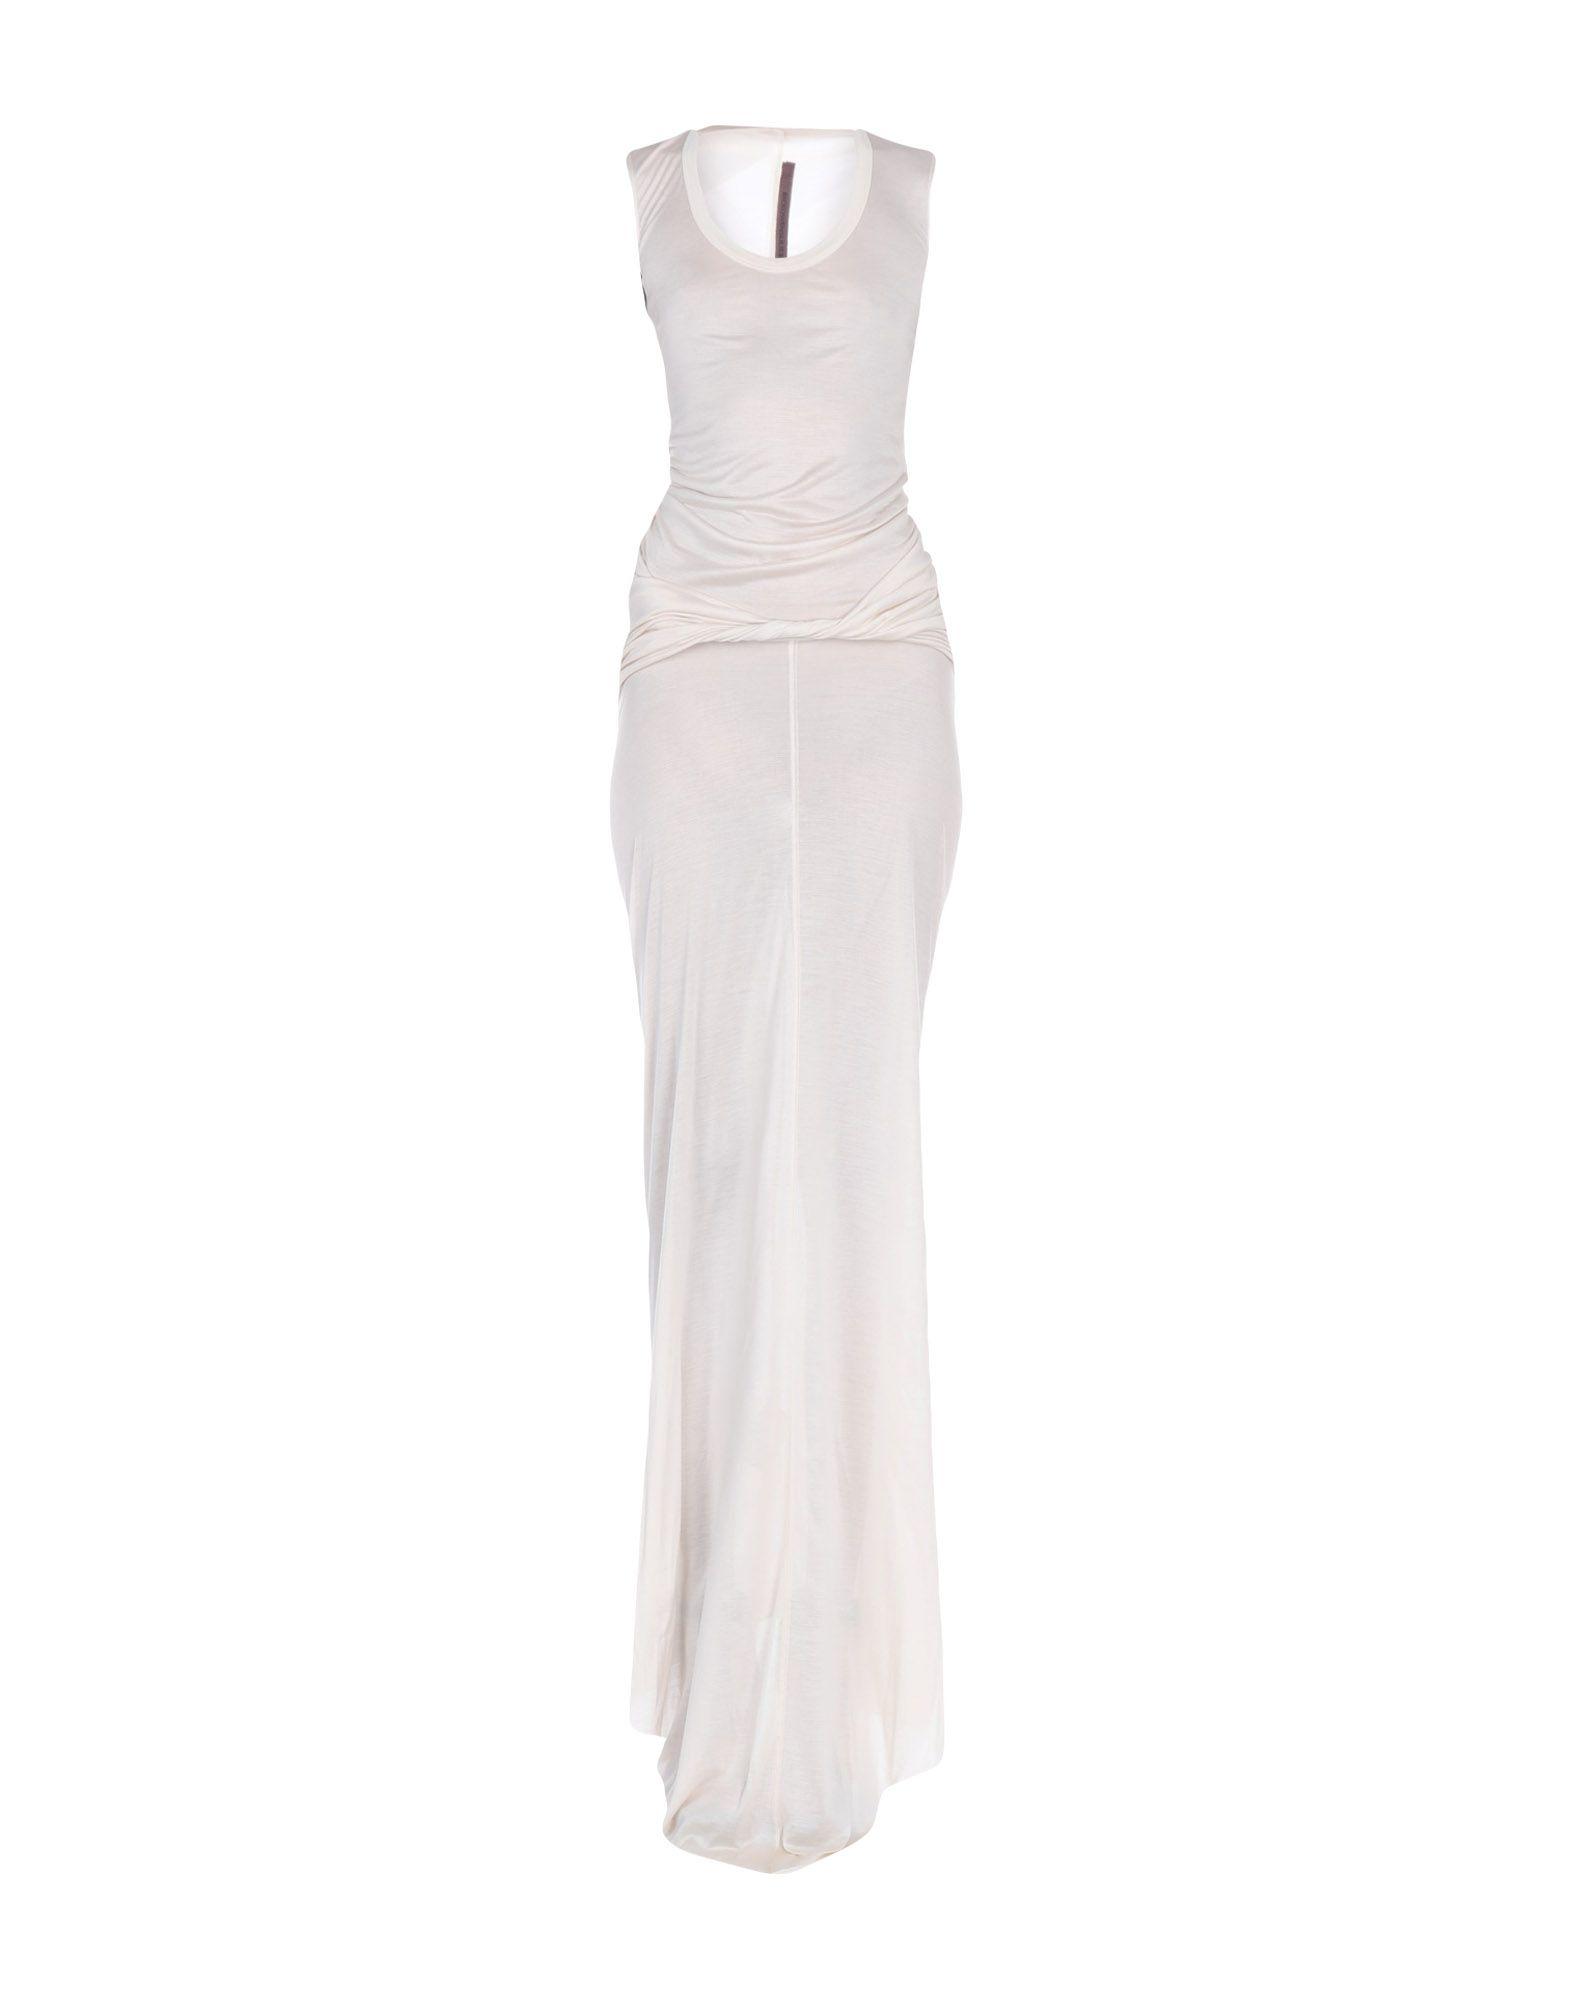 Lilies Formal Dress by Rick Owens, available on yoox.com for $510 Kim Kardashian Dress Exact Product